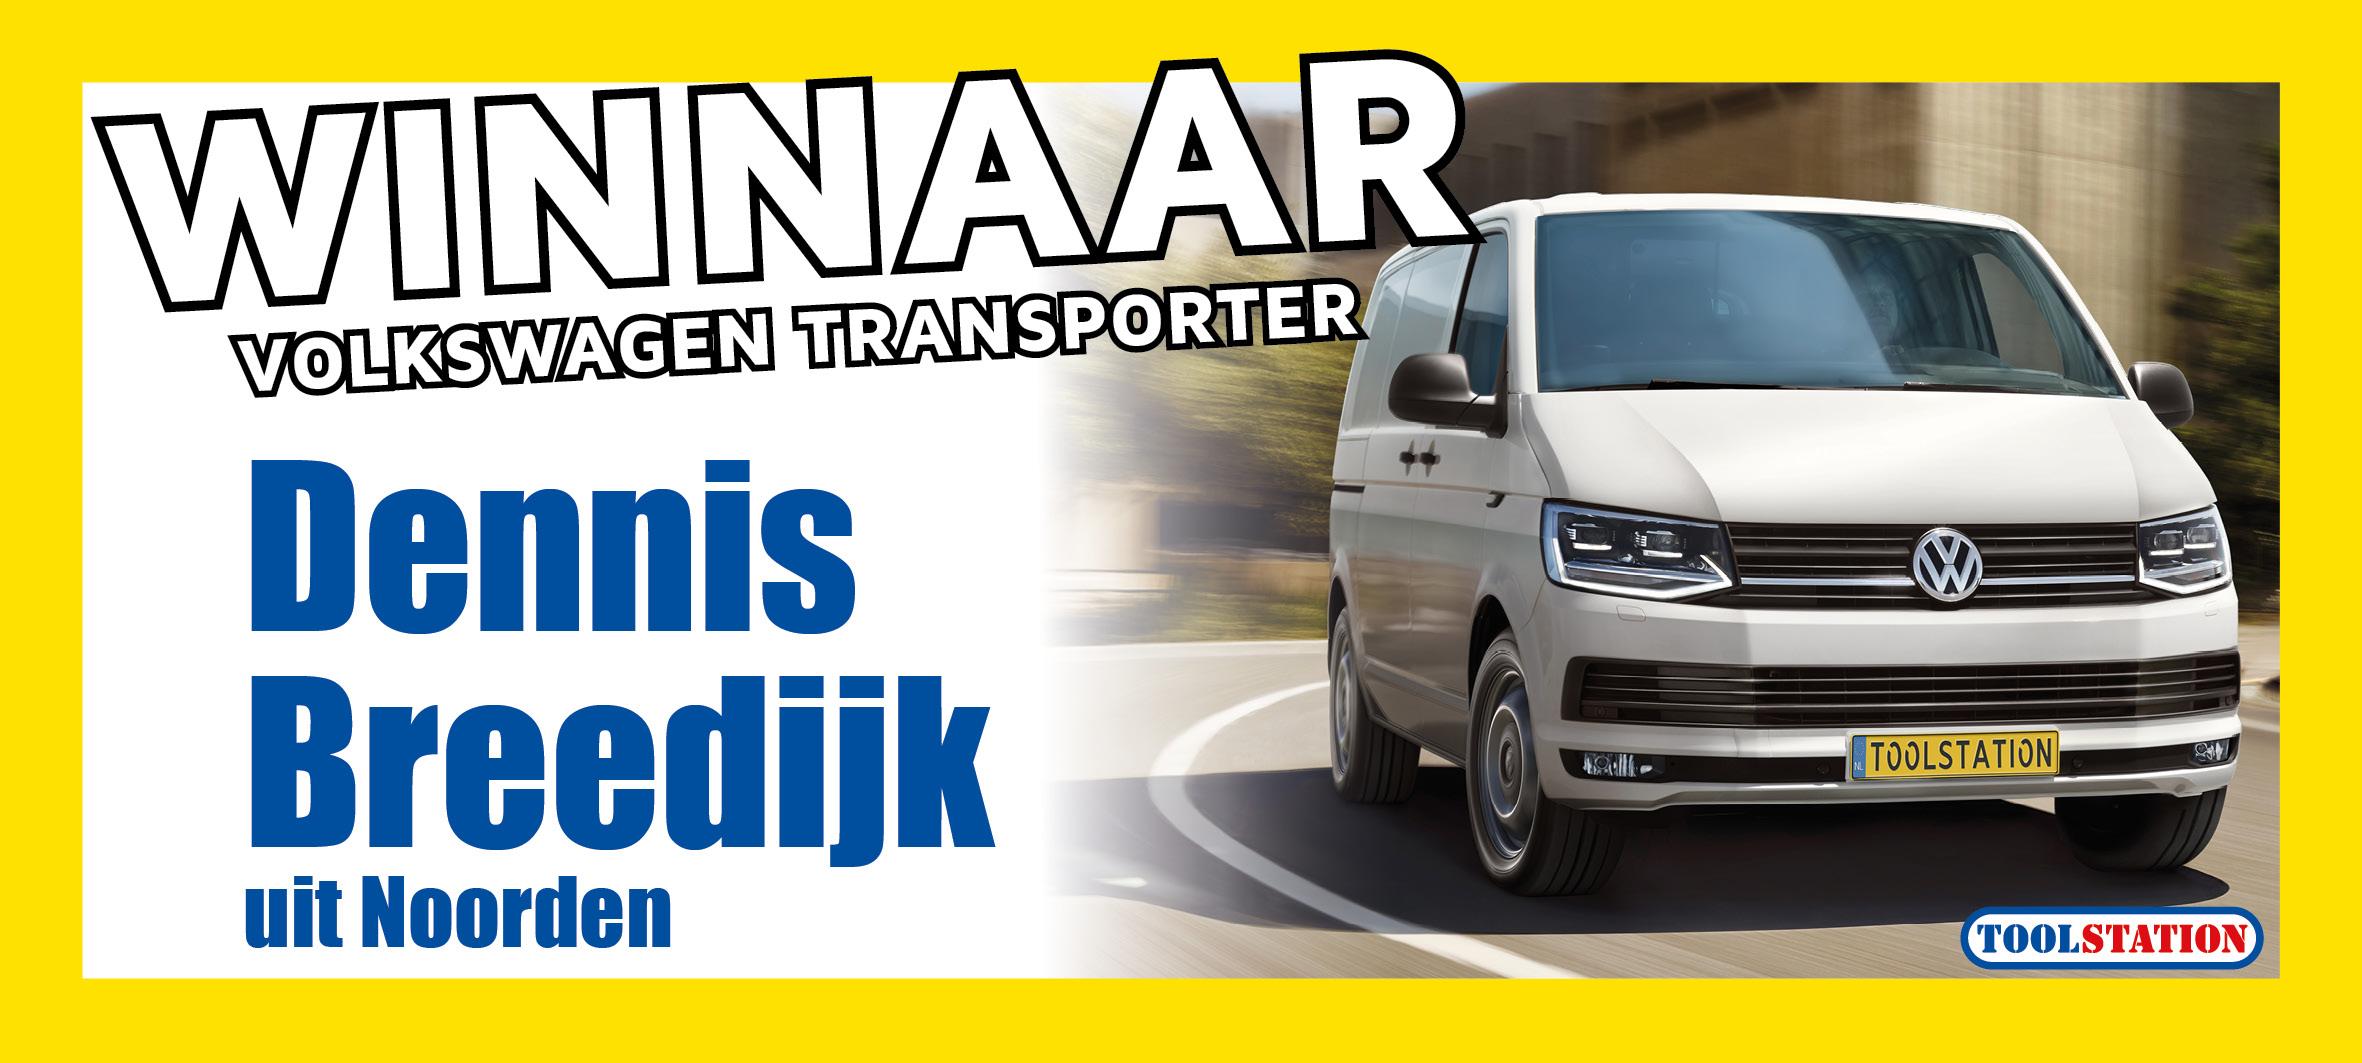 201602041 Facebook_VW transporter_Winnaar(1)